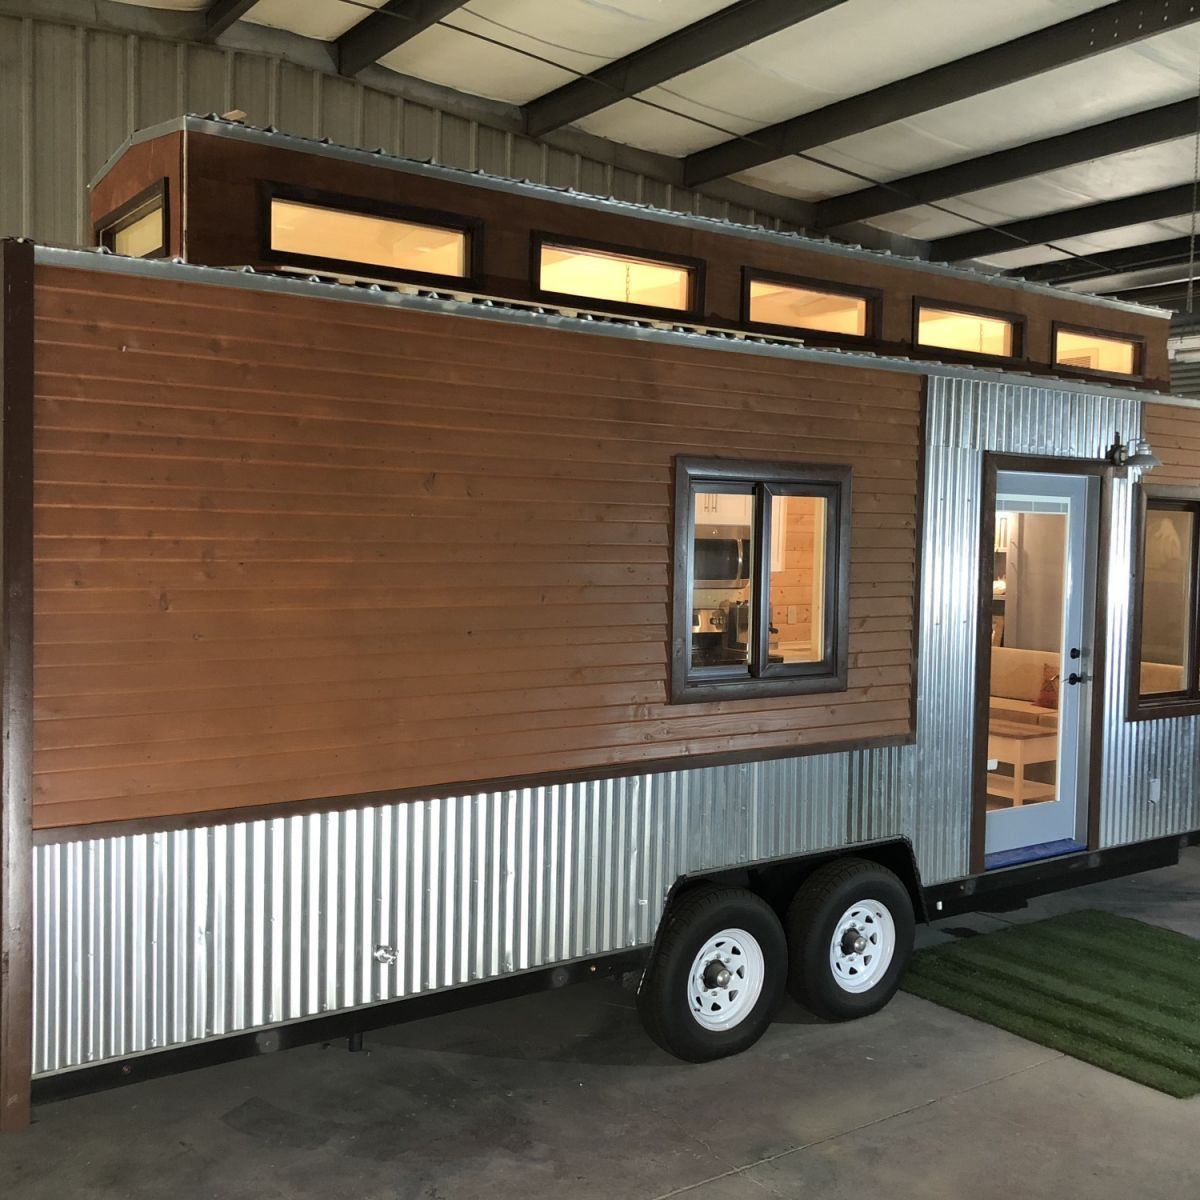 Award winning single level design tiny house for sale